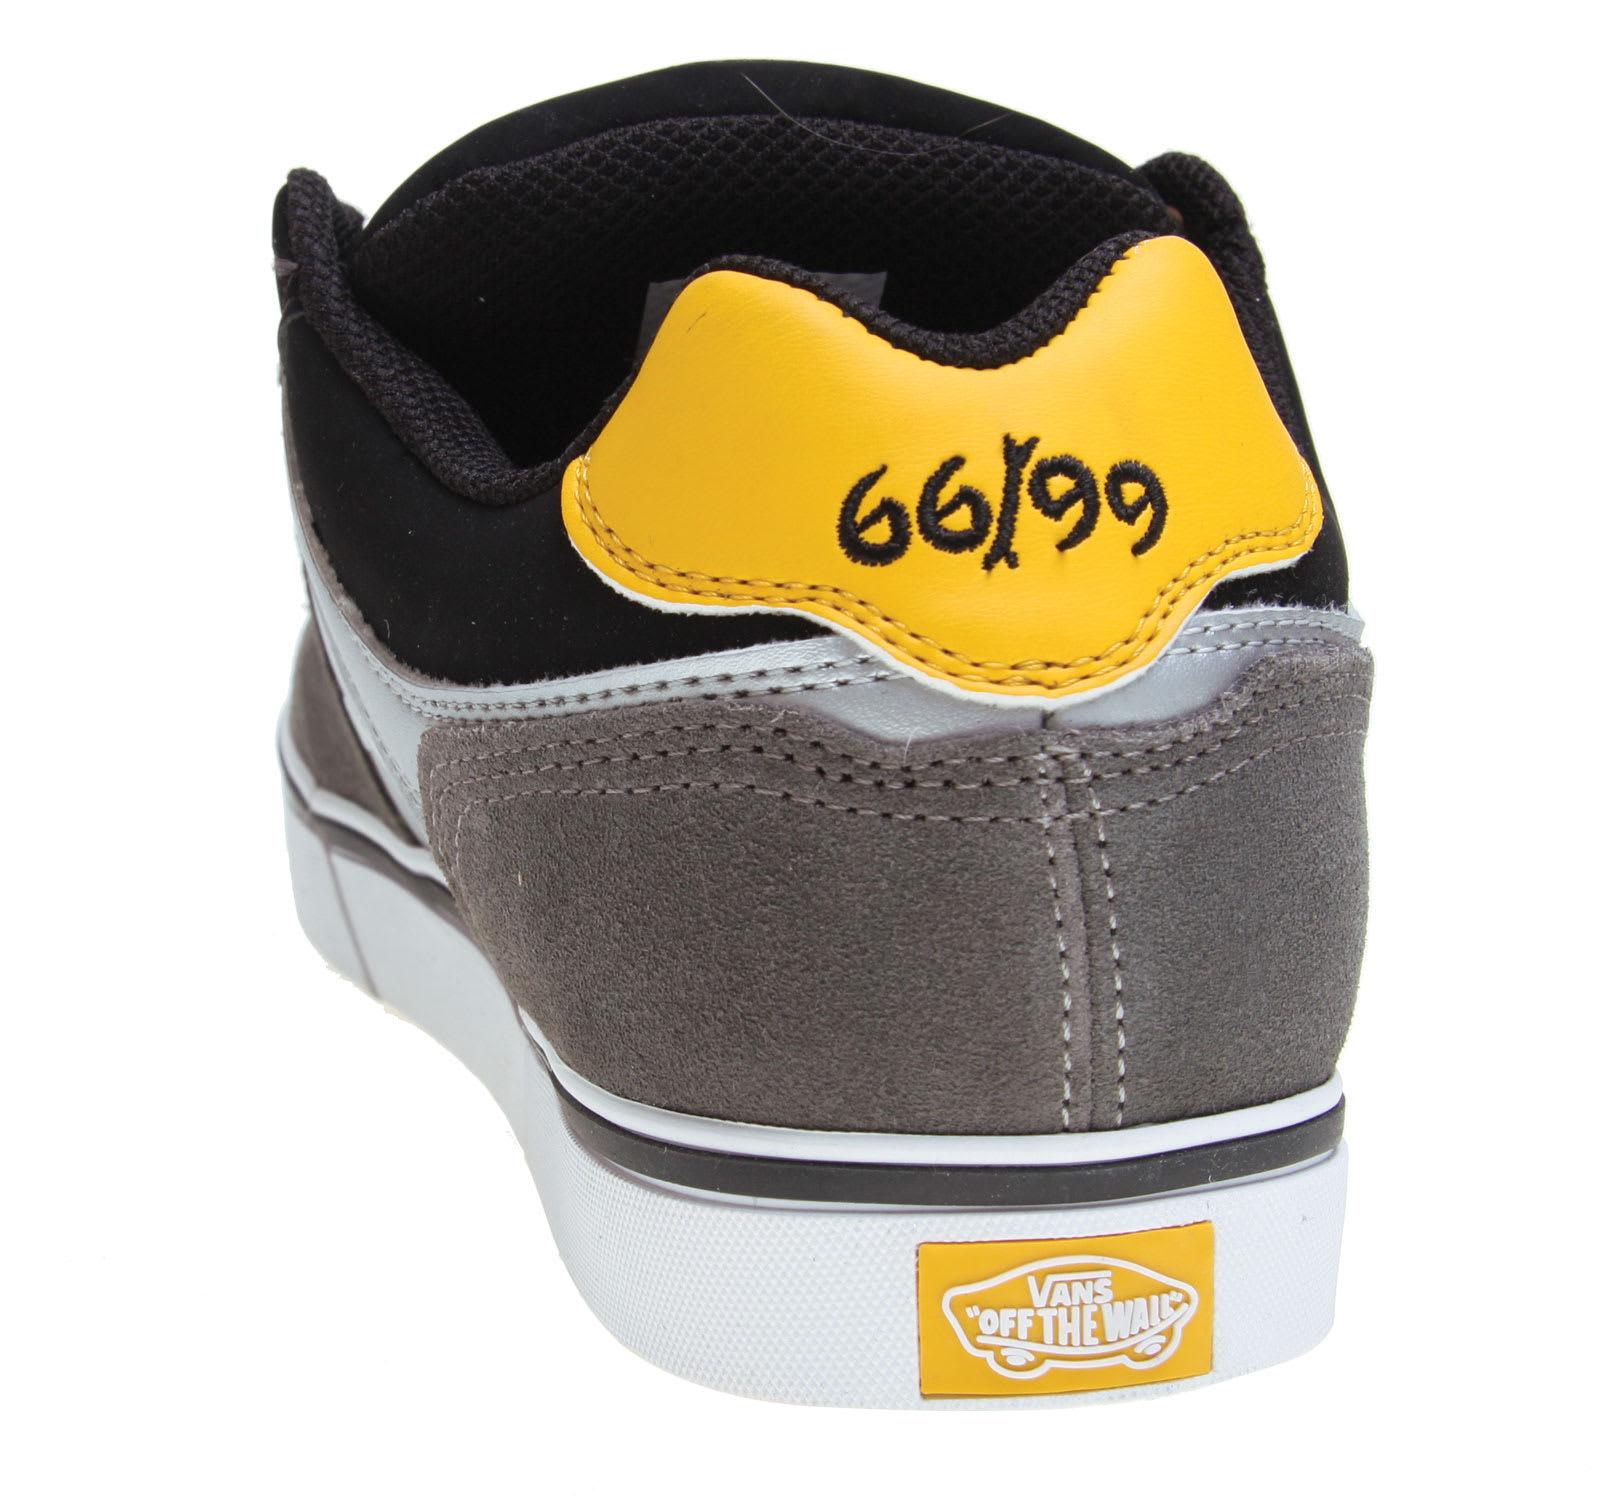 a196a05a9f Vans Rowley X Skate Shoes - thumbnail 2